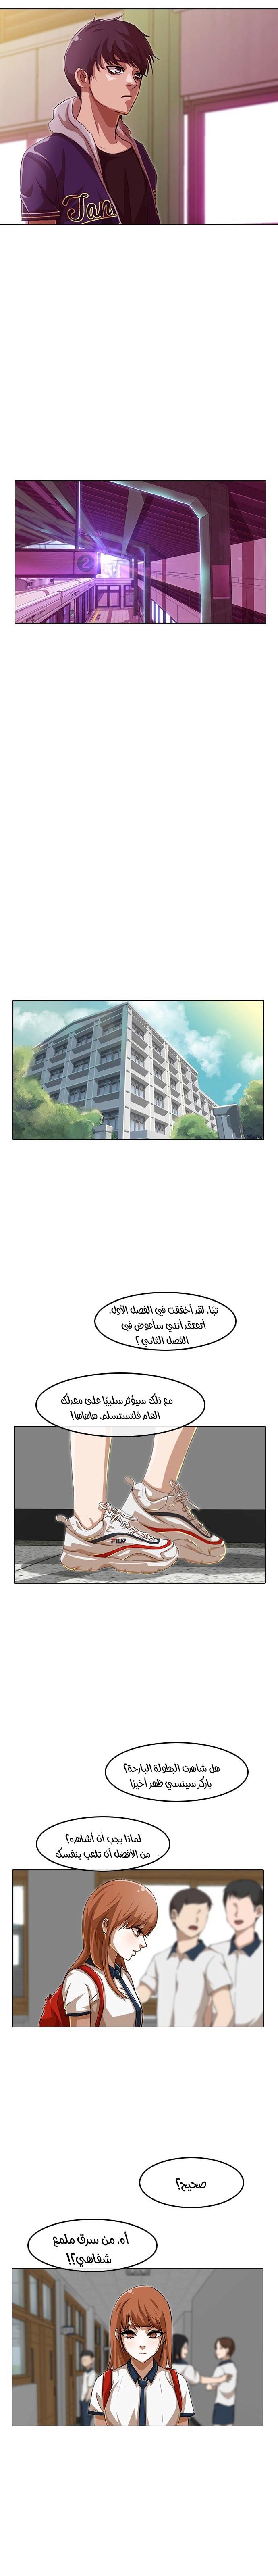 The Girl from Random Chatting - الفصل 57 أونلاين 1412